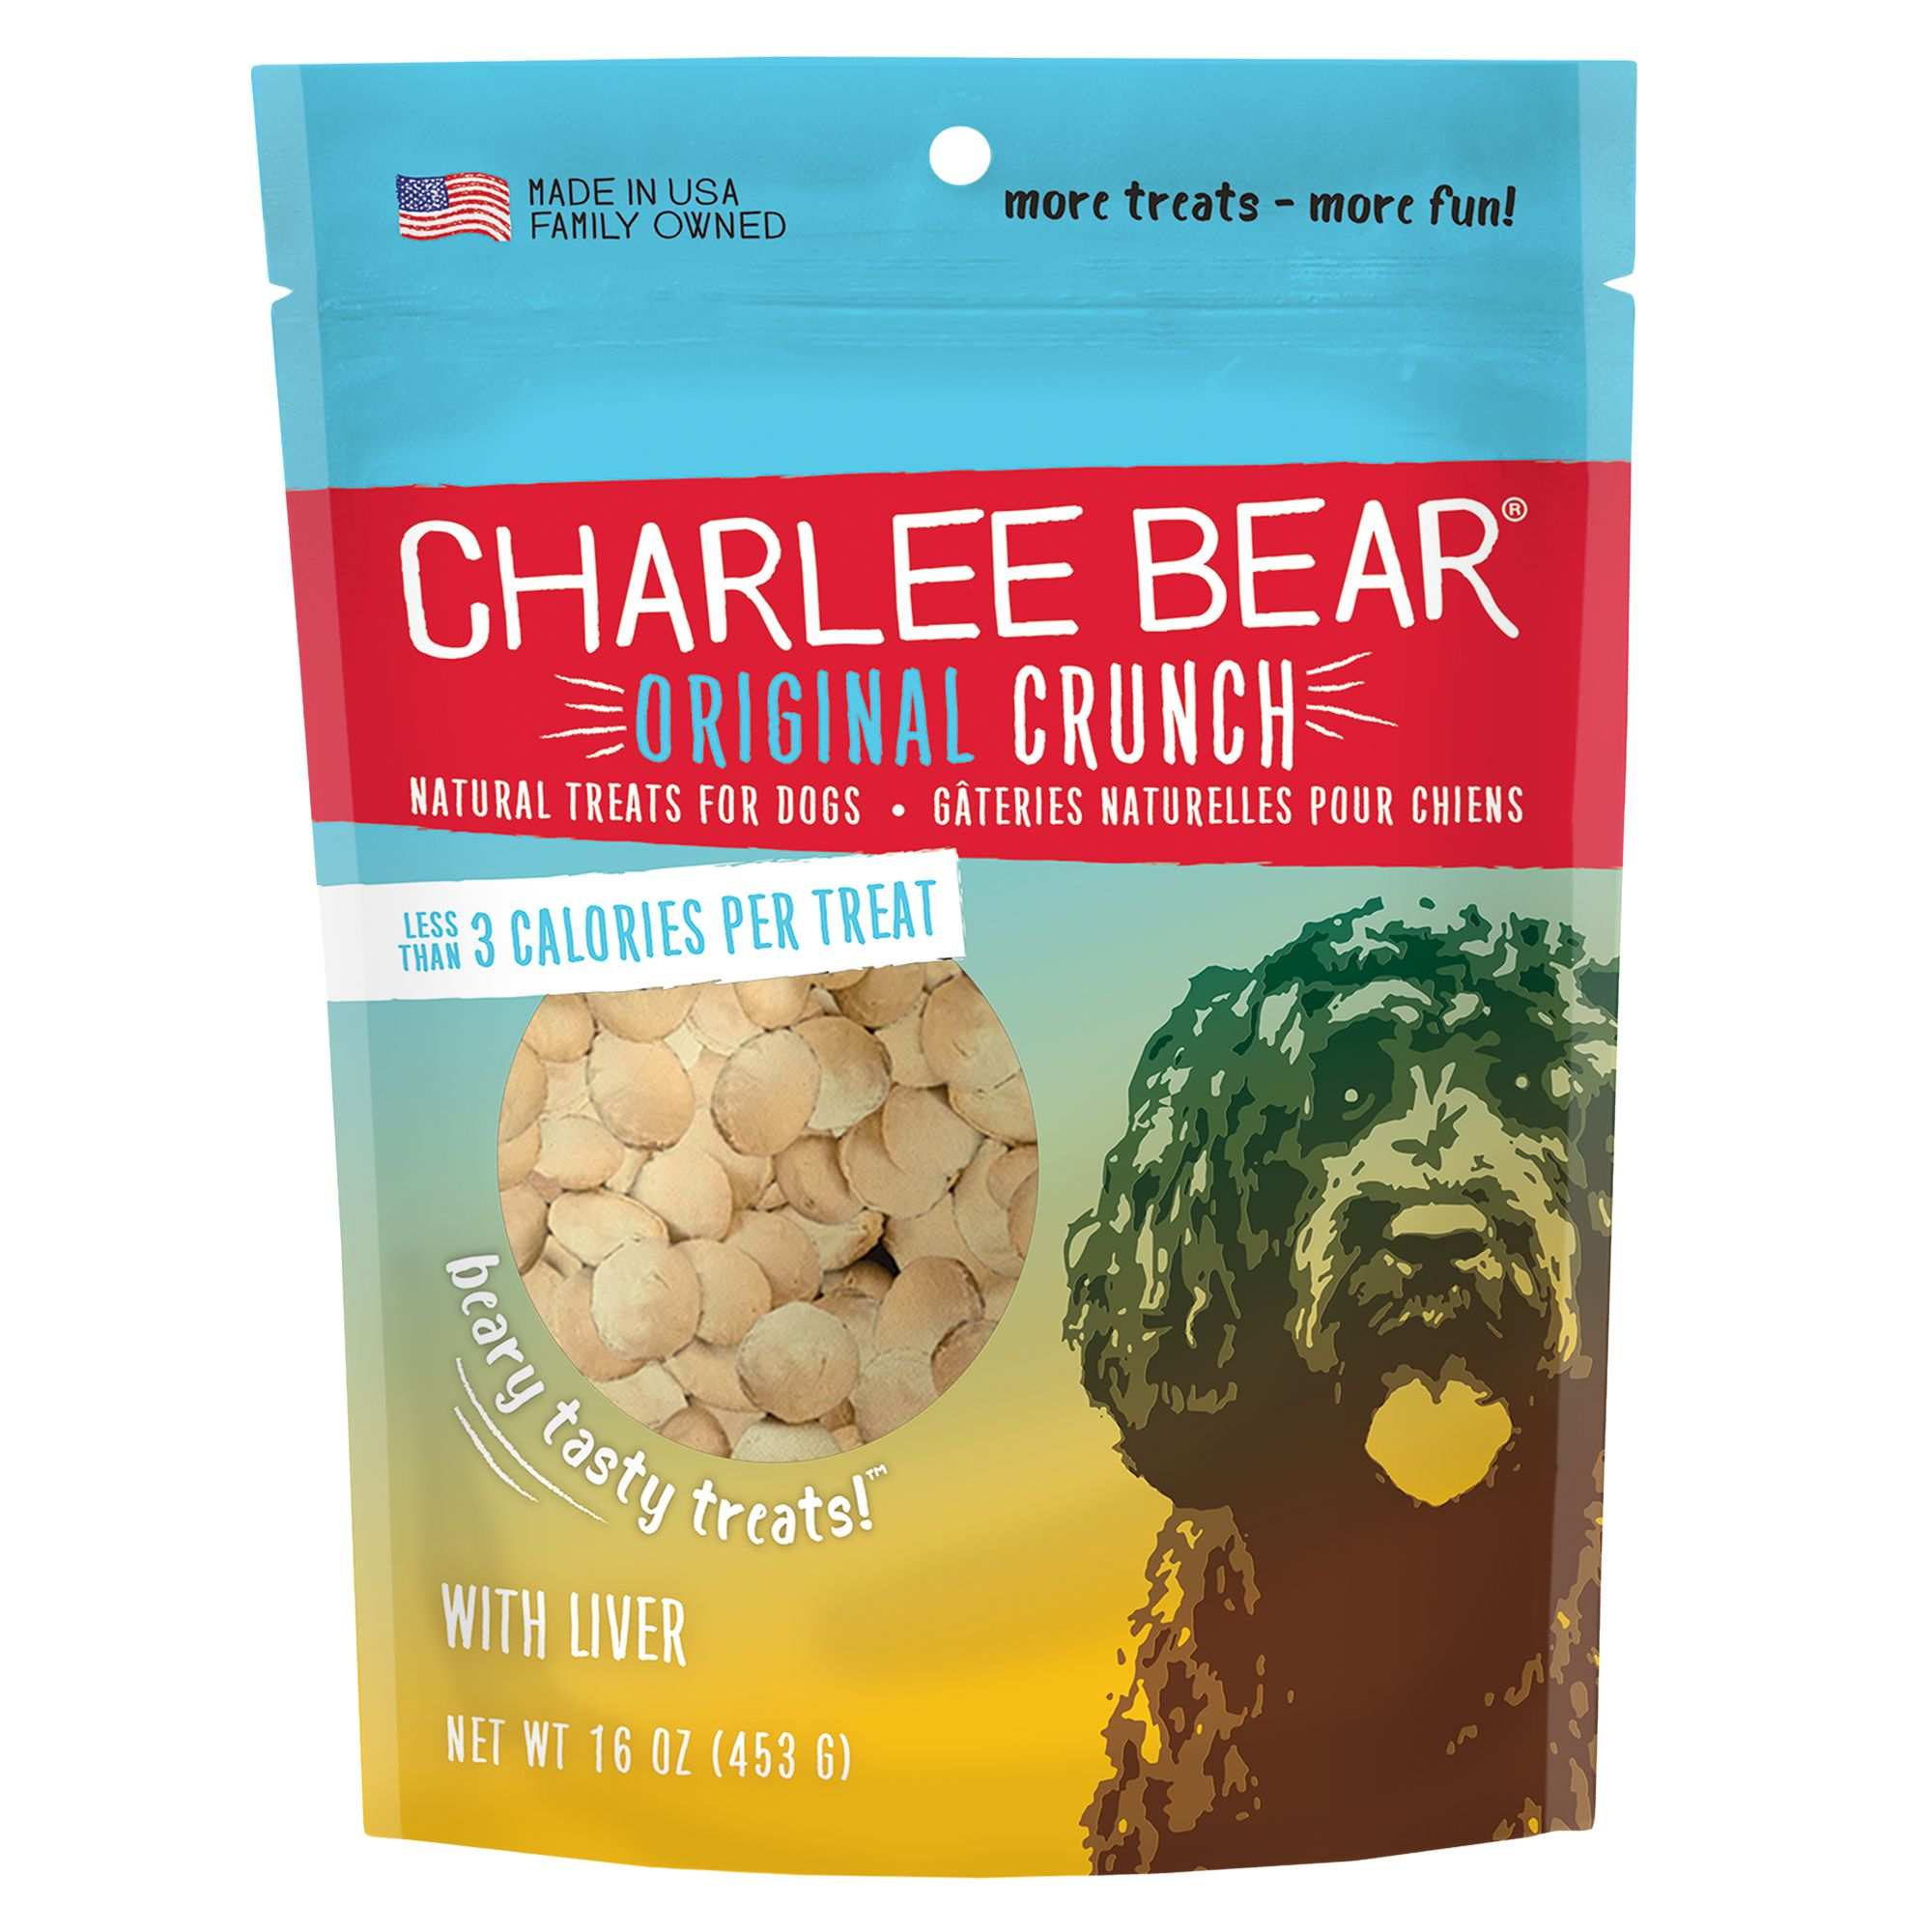 Charlee Bear All Natural Dog Treat Size 16 Oz